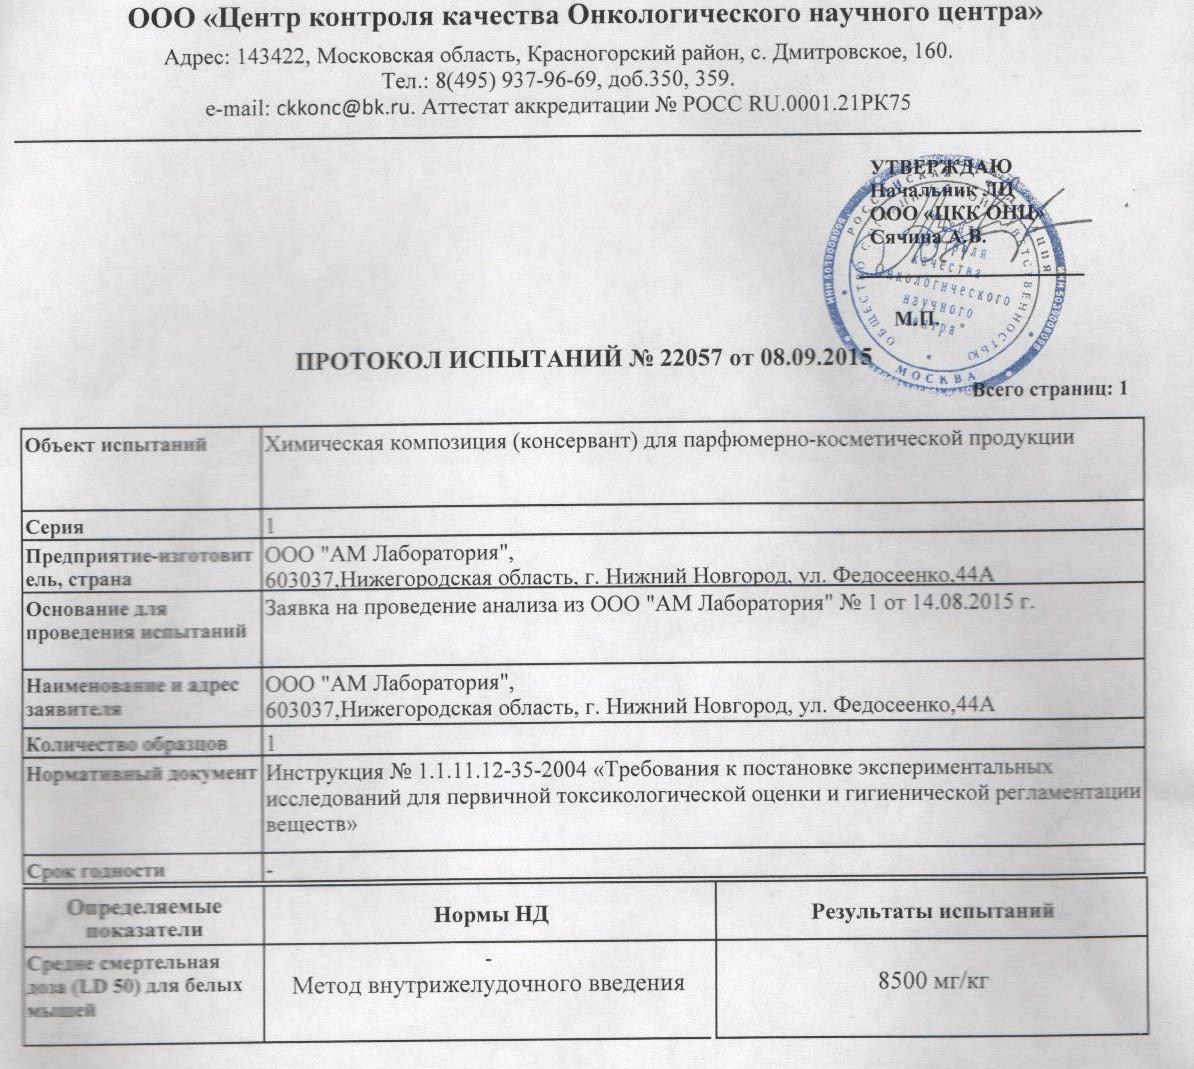 LD-50-activpack.ru-min